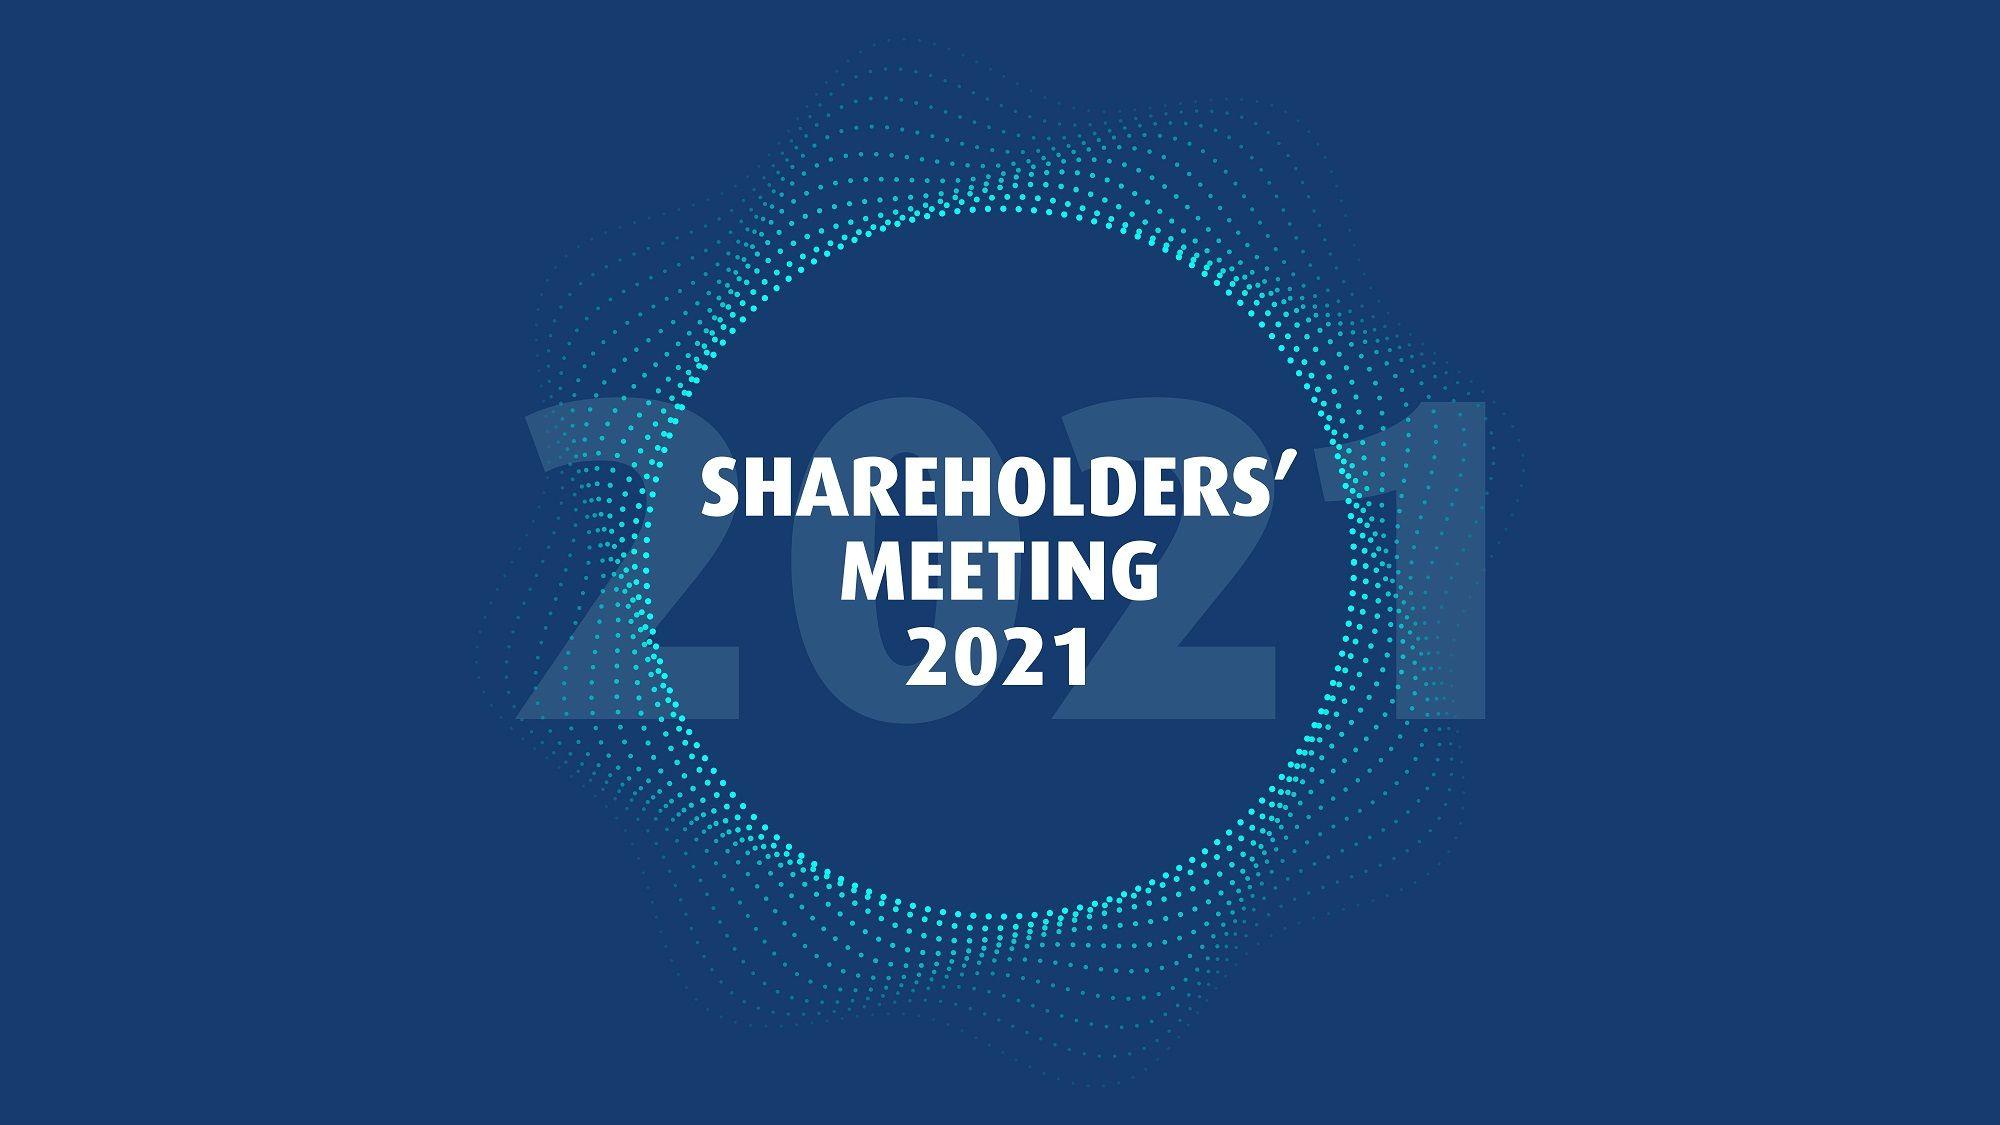 Shareholders' meeting